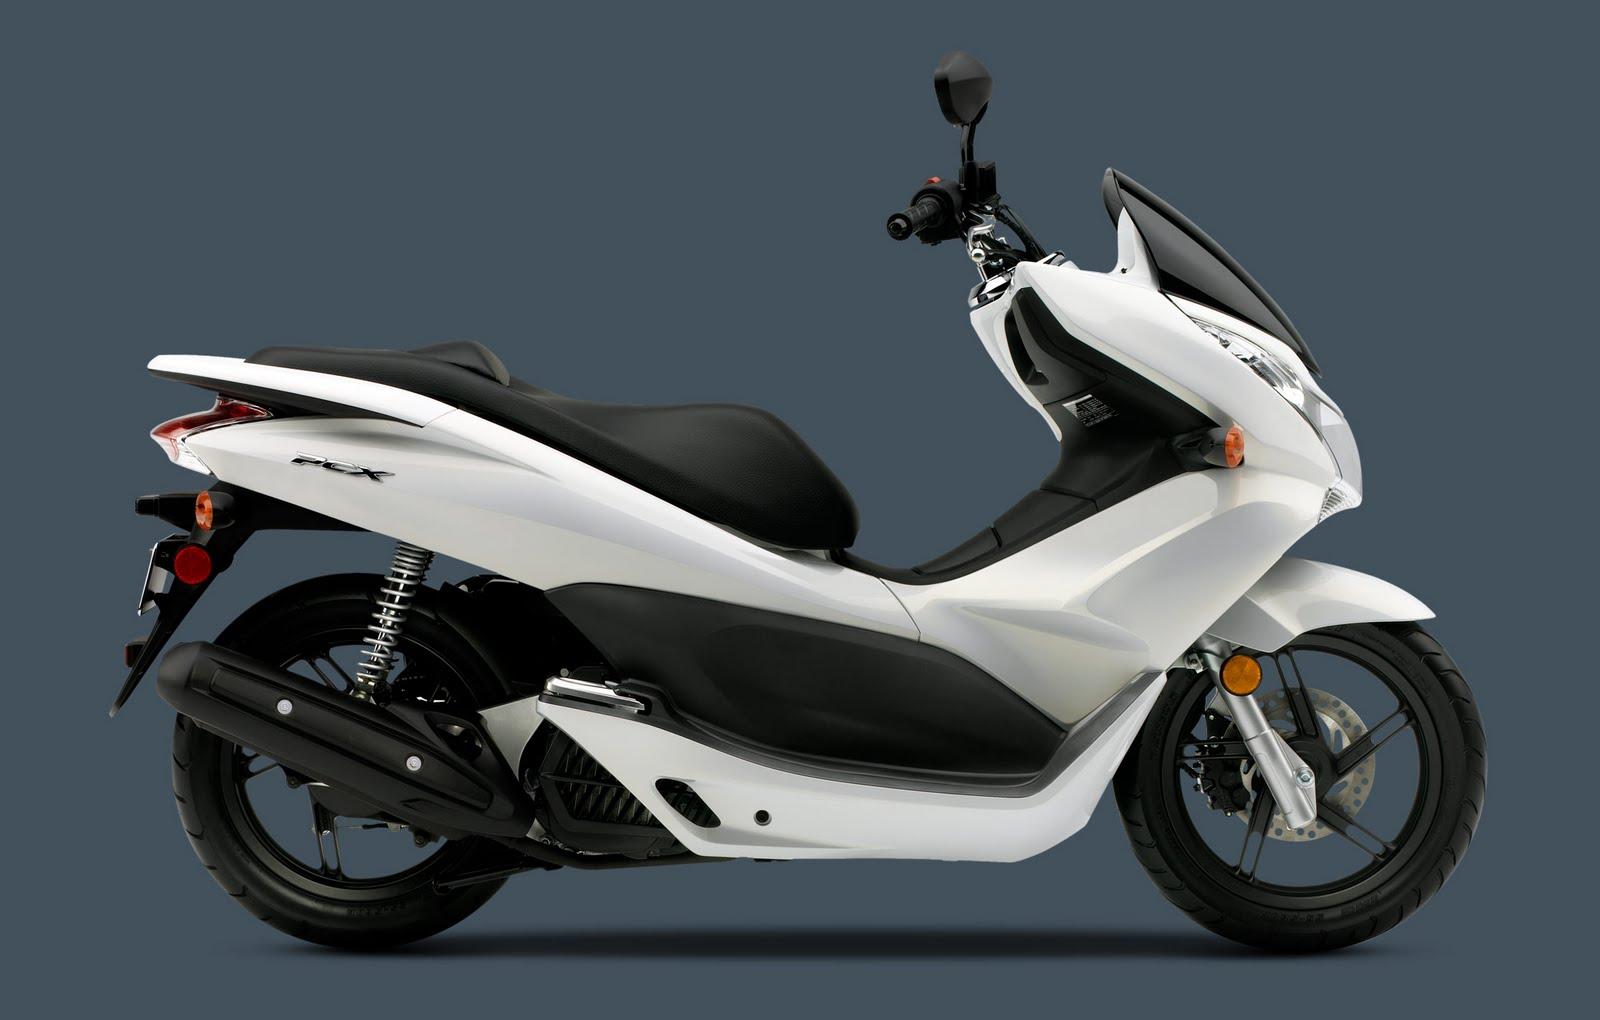 http://3.bp.blogspot.com/_J3_liDBfbvs/S_EByariTkI/AAAAAAAArvQ/23Xu0P_LL9I/s1600/2011-Honda-PCX-Sporty-Scooter.jpg